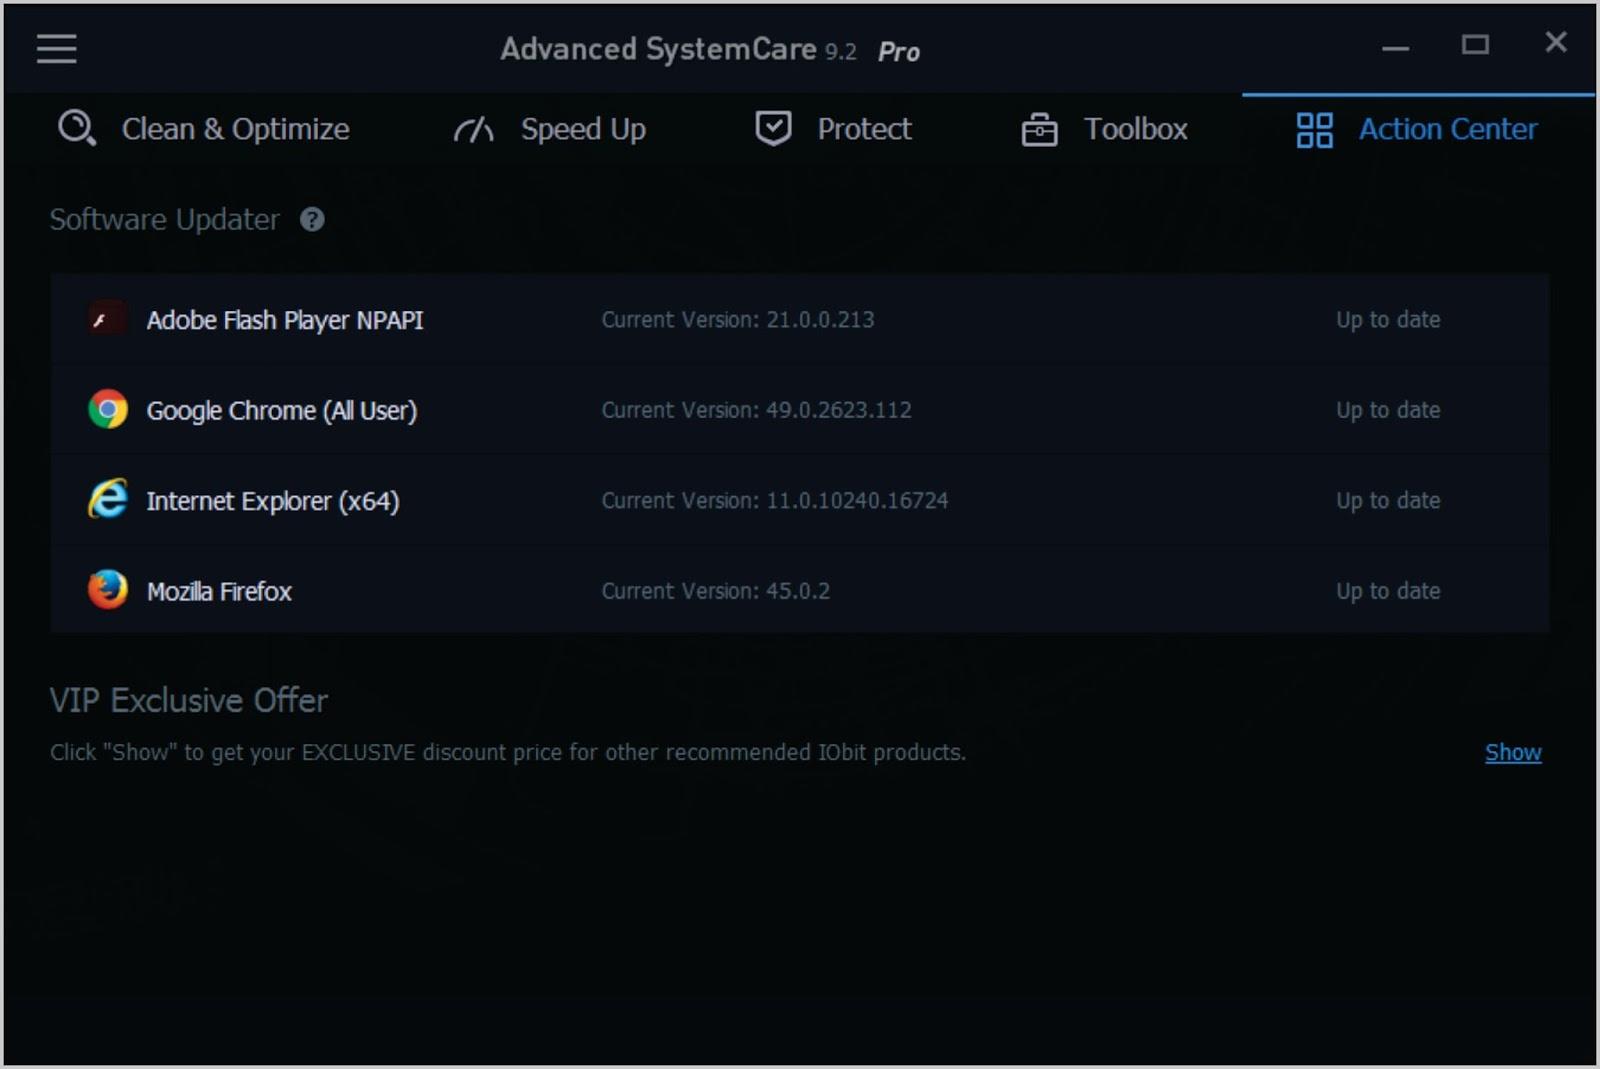 advanced systemcare pro 9.2 лицензионный ключ